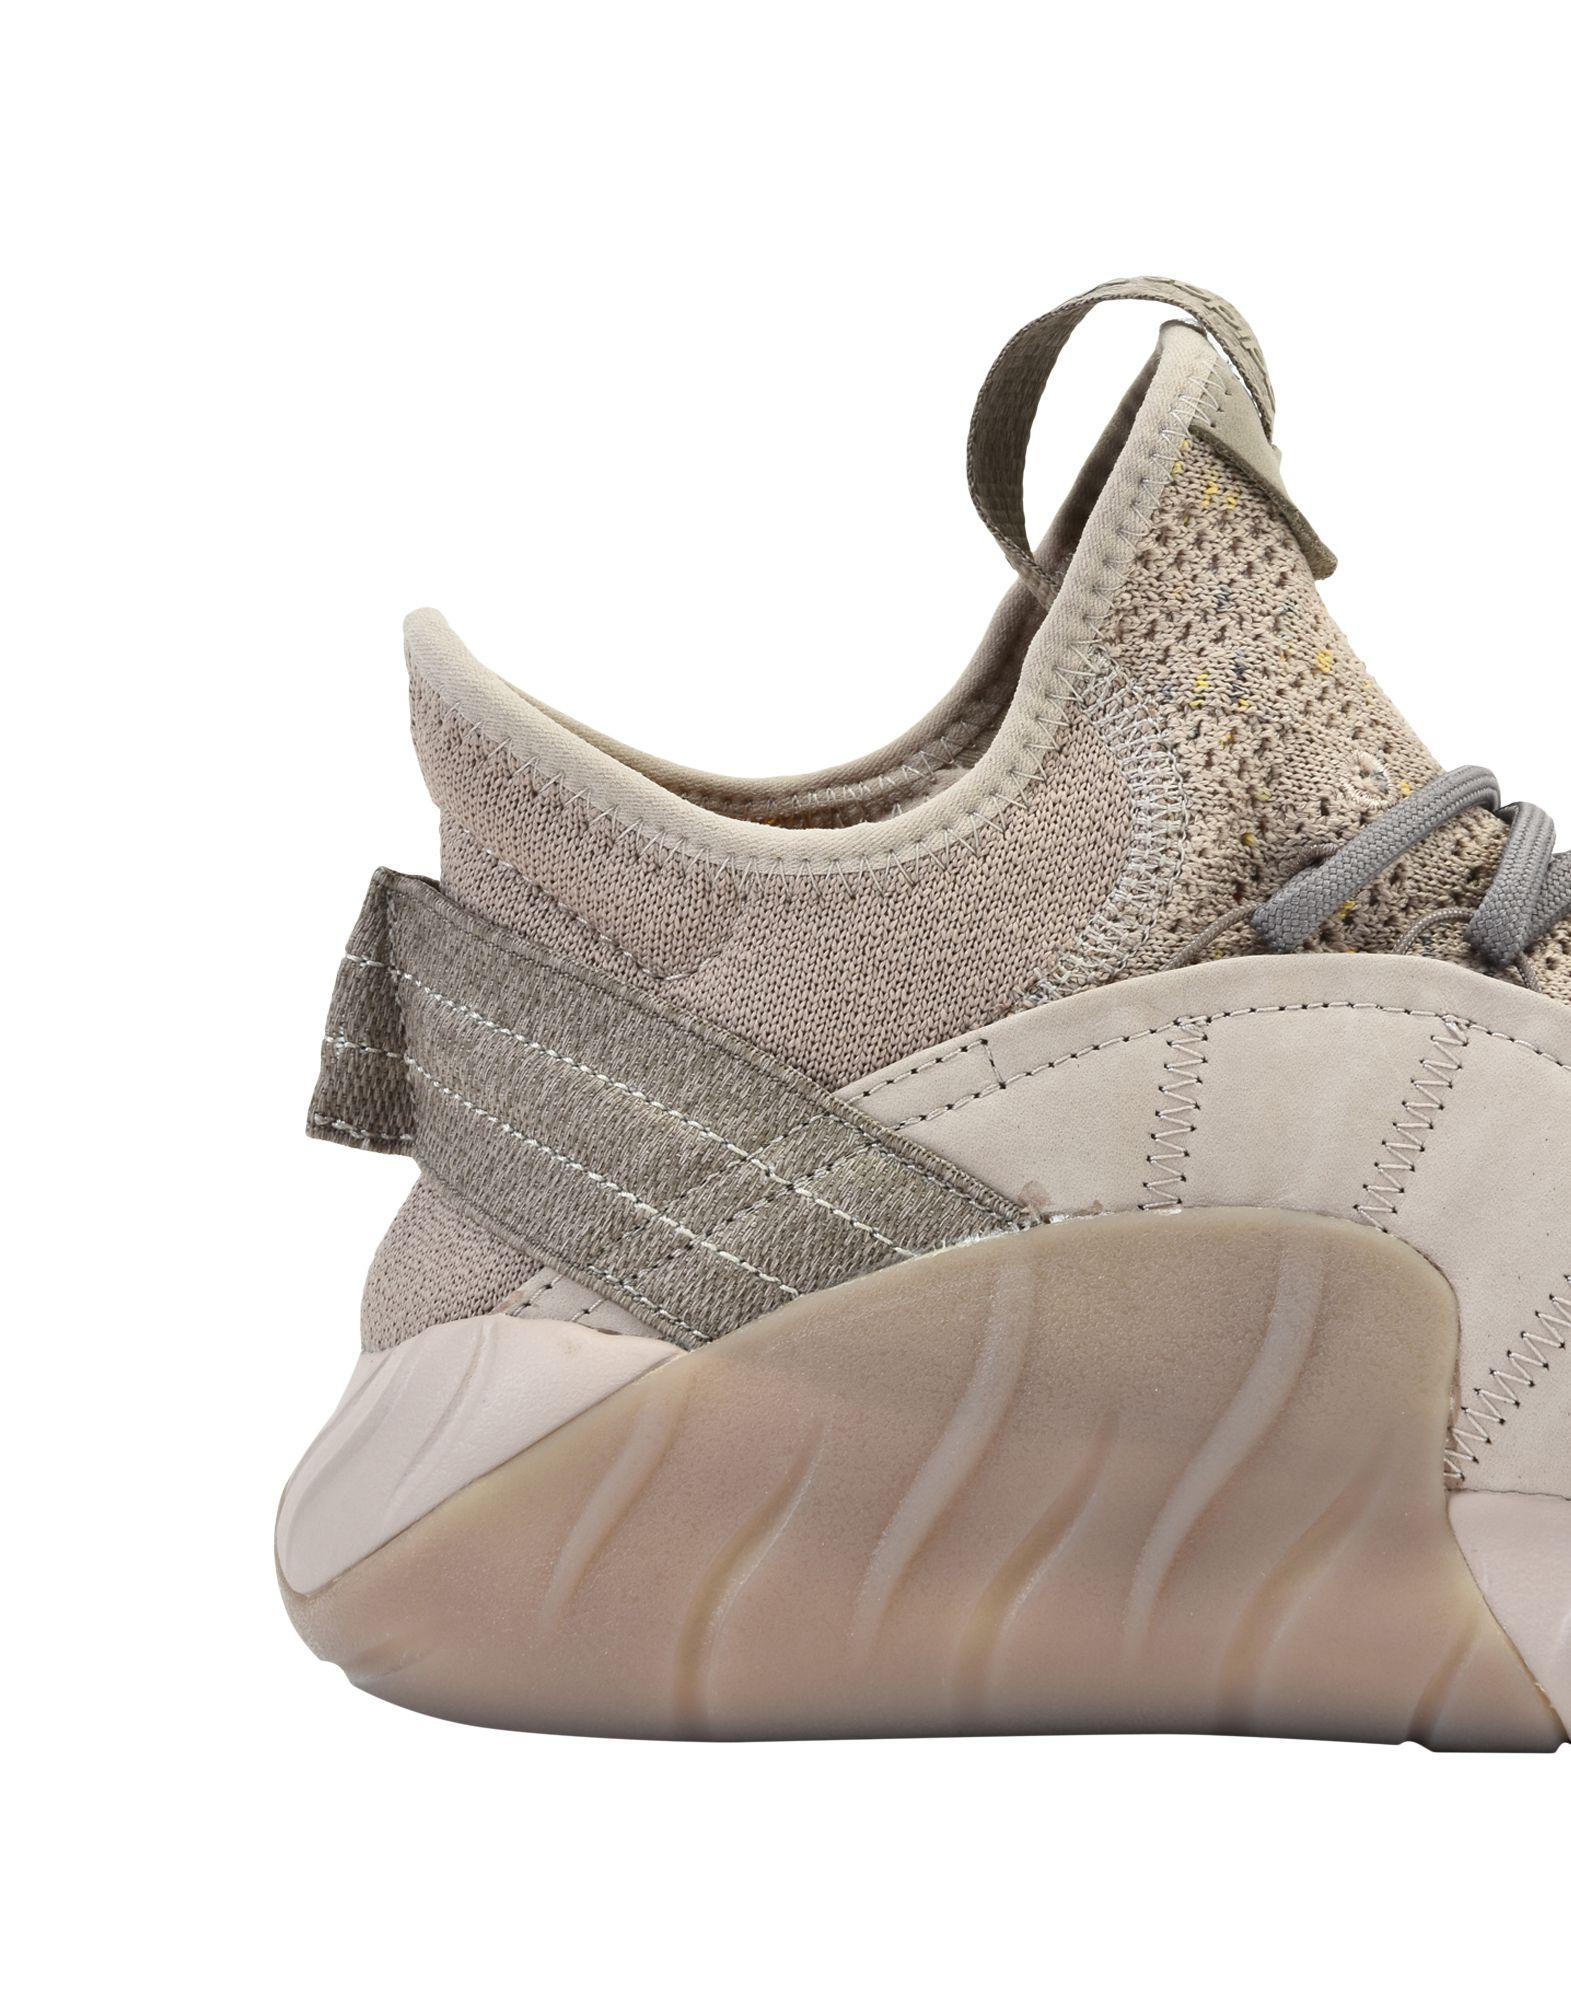 Rabatt echte Rise Schuhe Adidas Originals Tubular Rise echte  11353811OB e099af